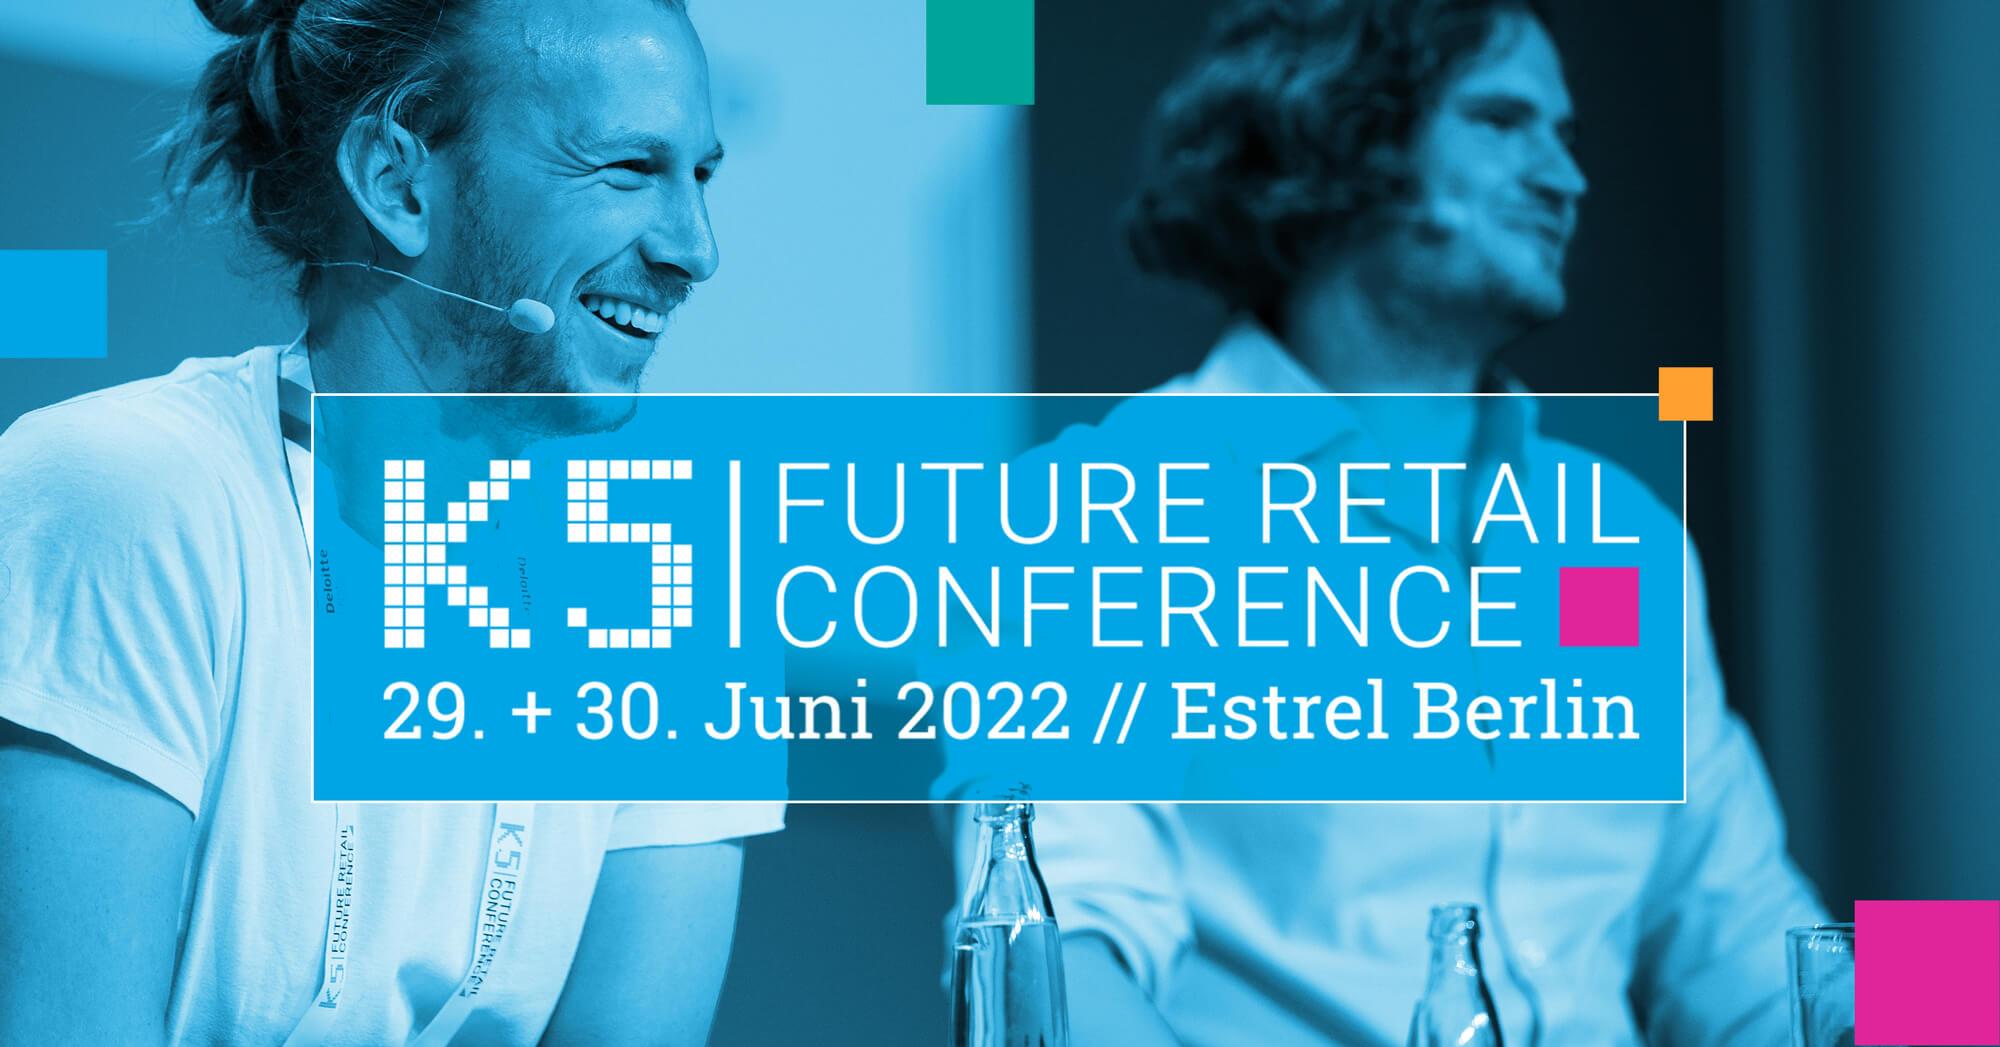 K5 Konferenz - Future Retail Conference in Berlin